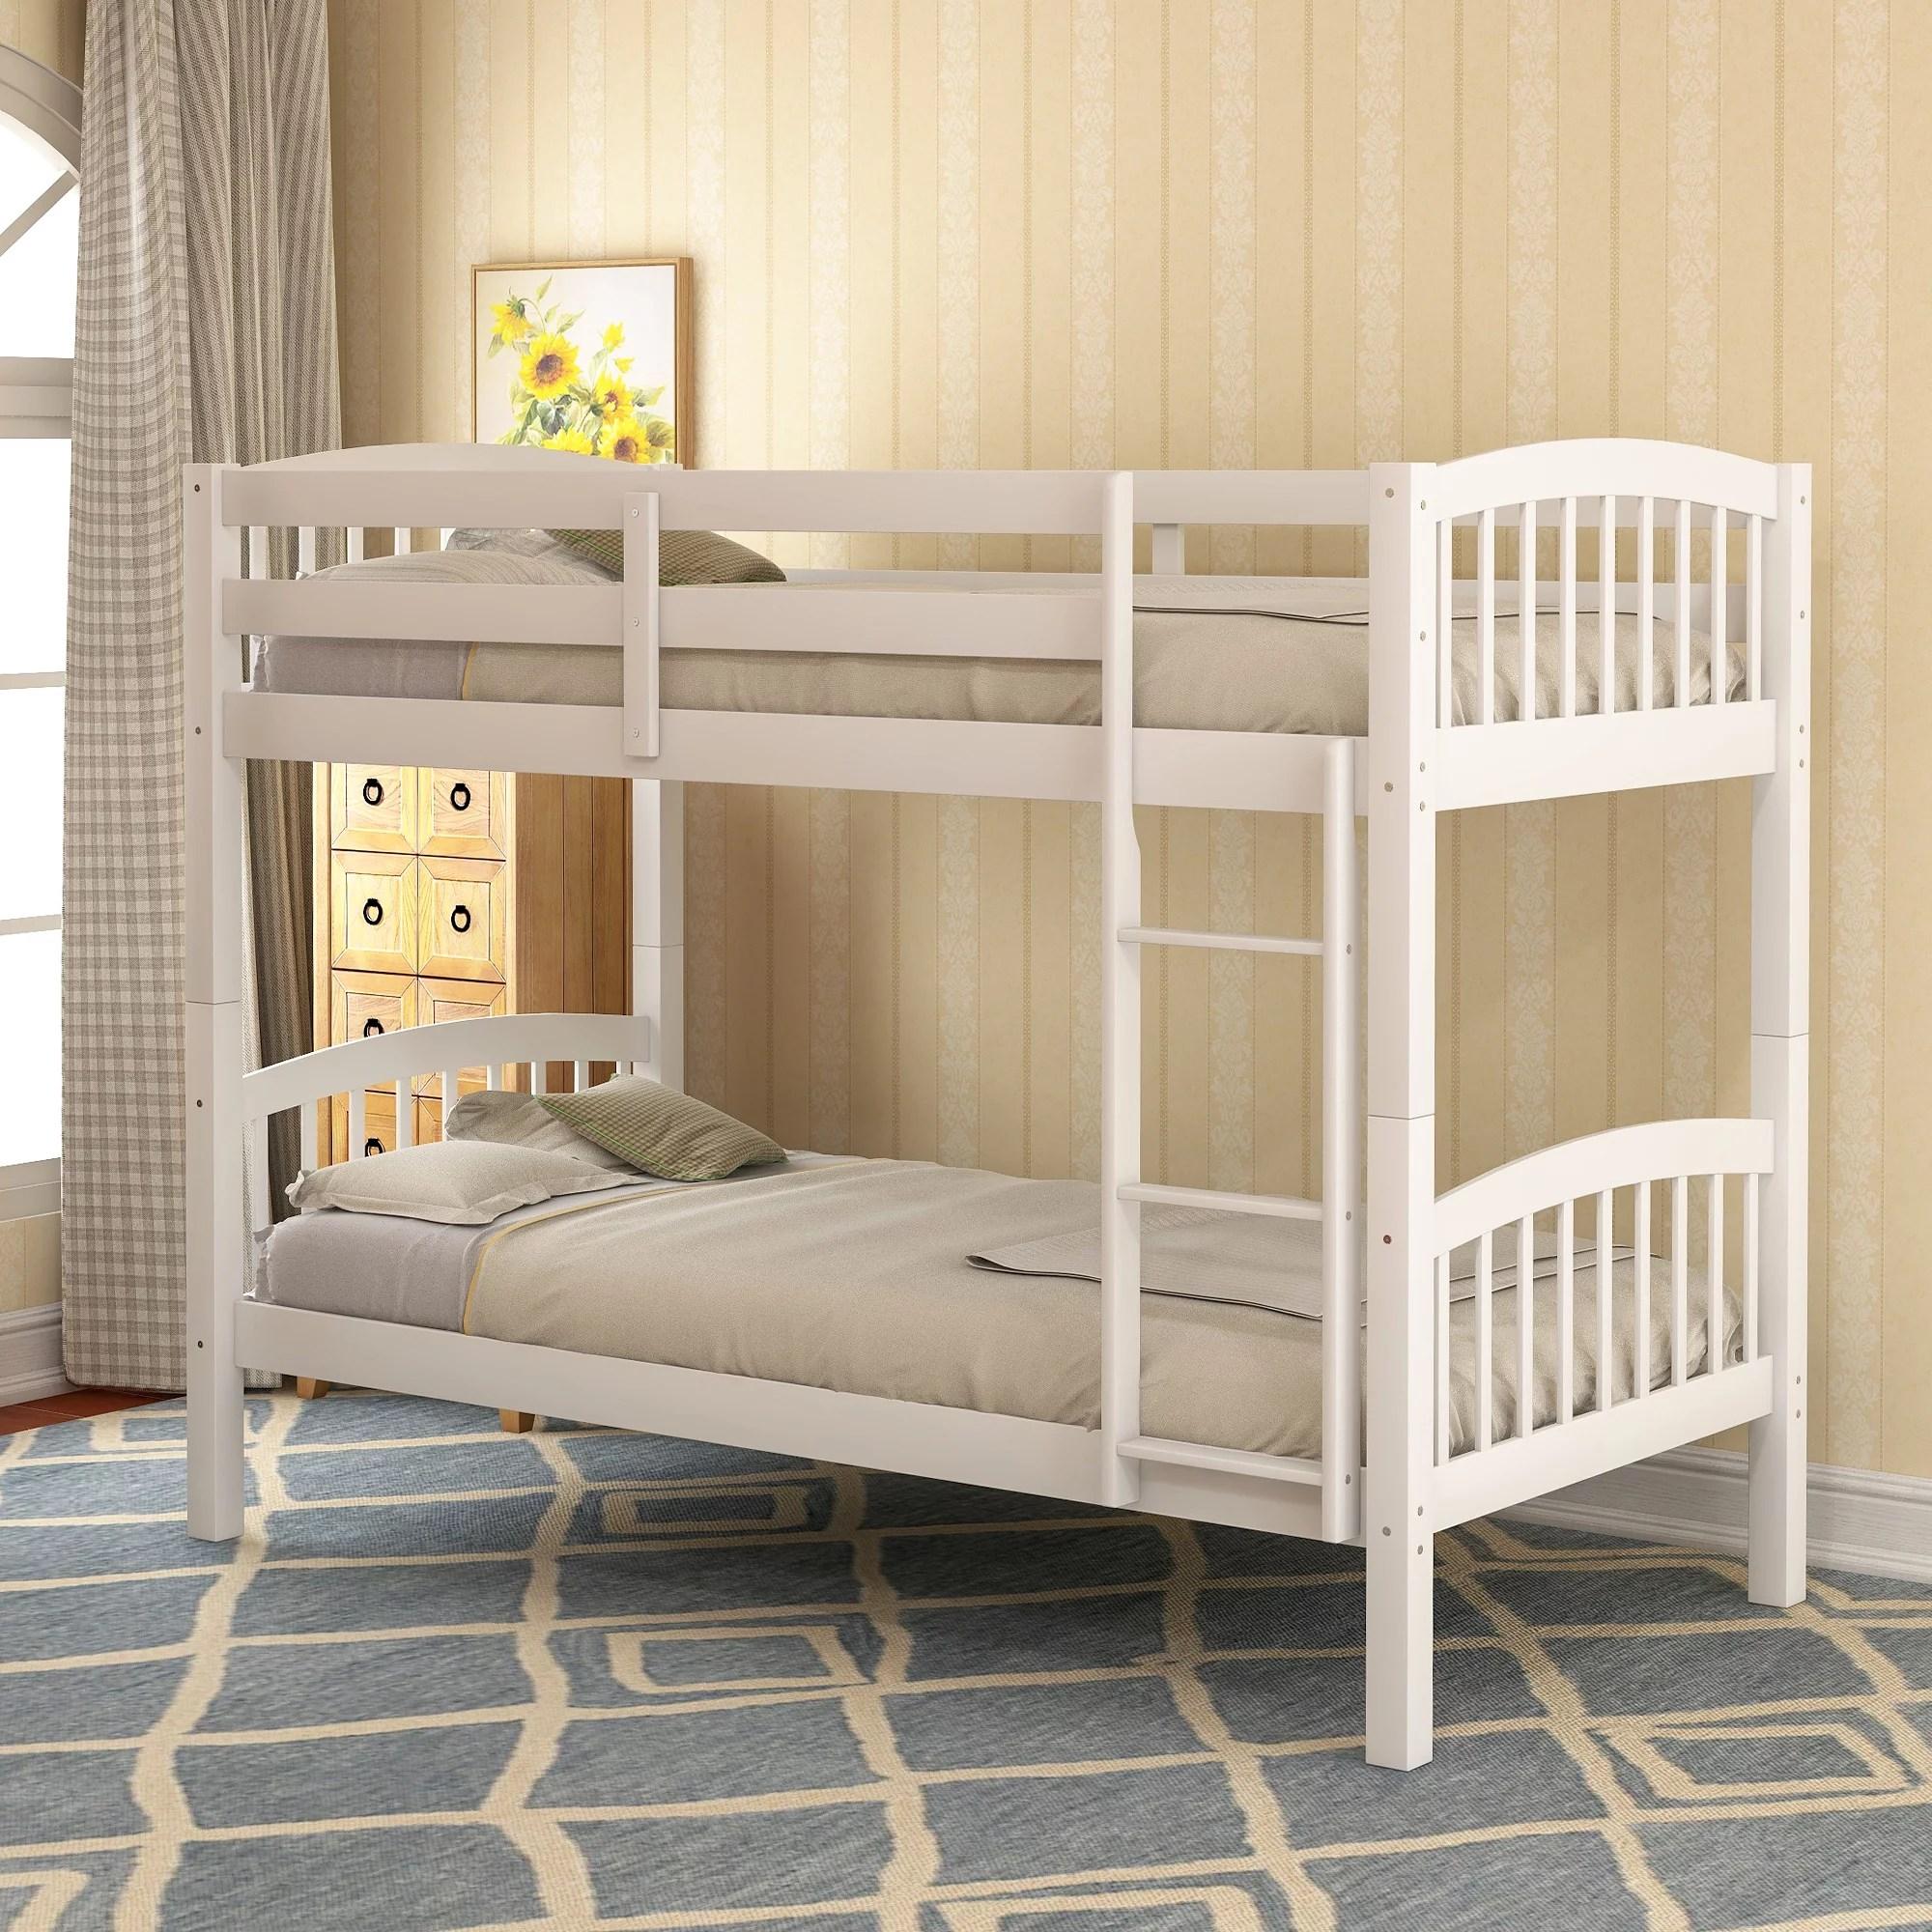 clearance bunk beds twin over twin urhomepro wood kids on walmart bedroom furniture clearance id=57038